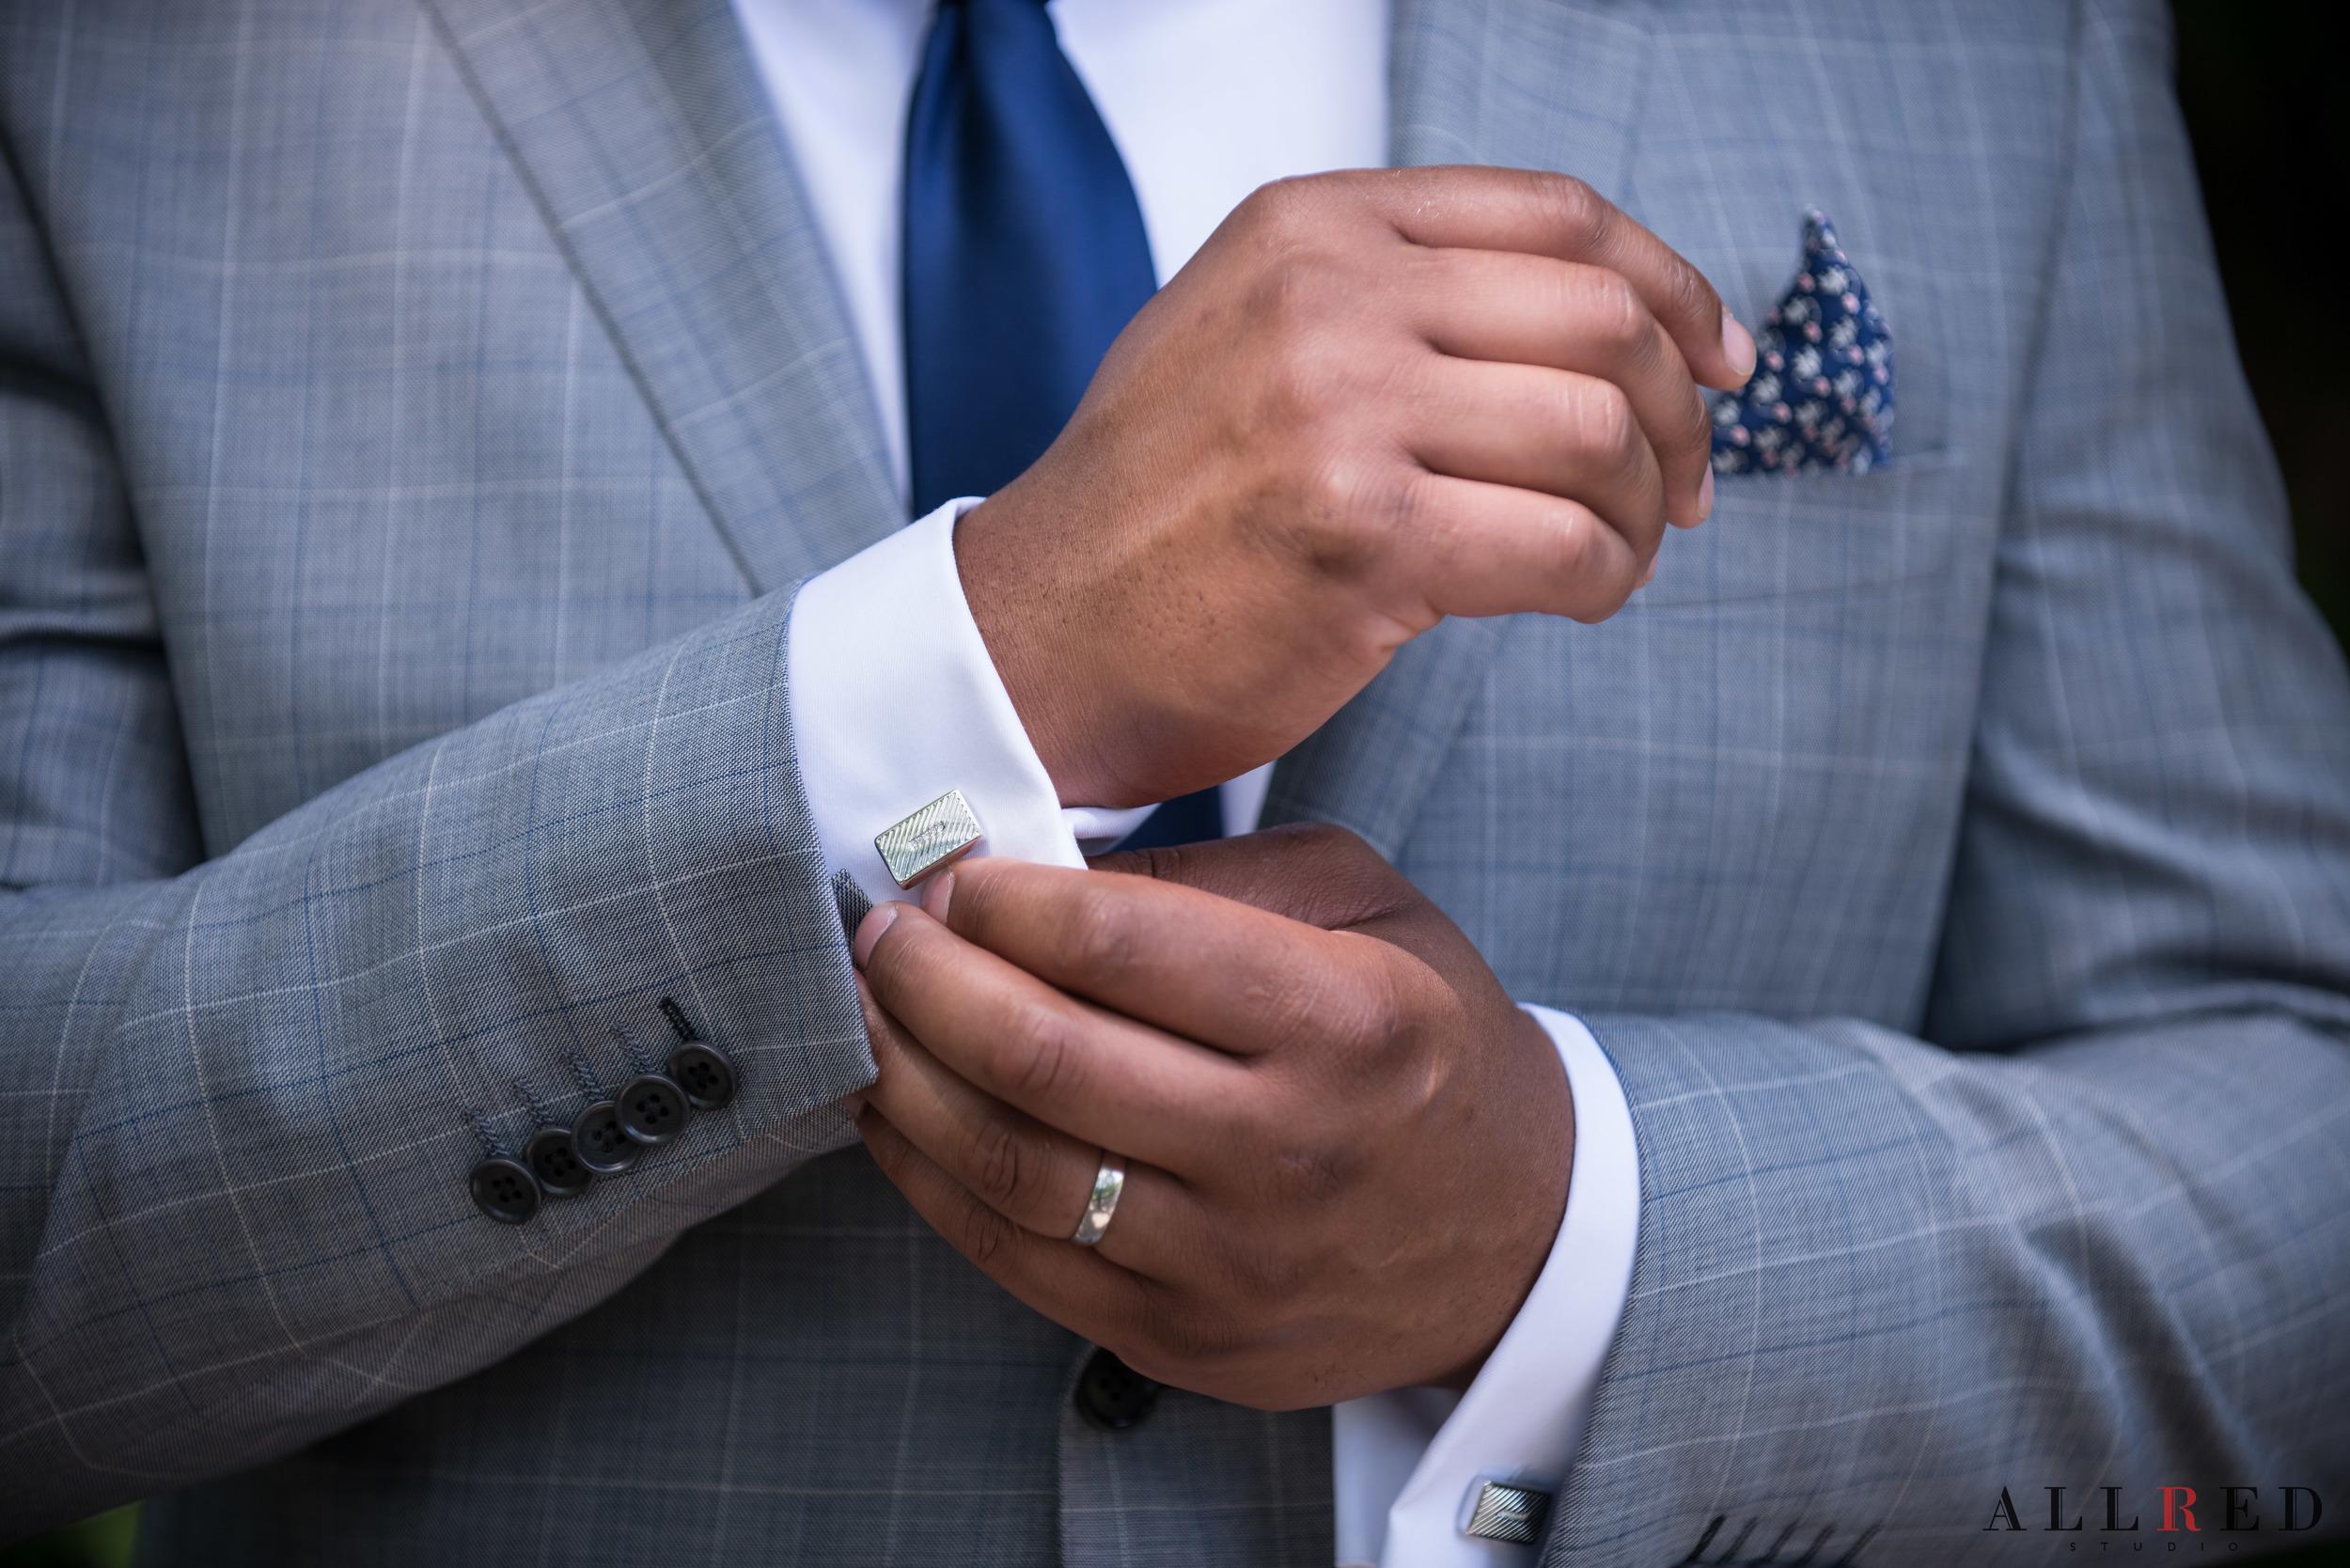 Wedding-central-park-allred-studio-new-york-photographer-new-jersey-hudson-valley-2564.jpg